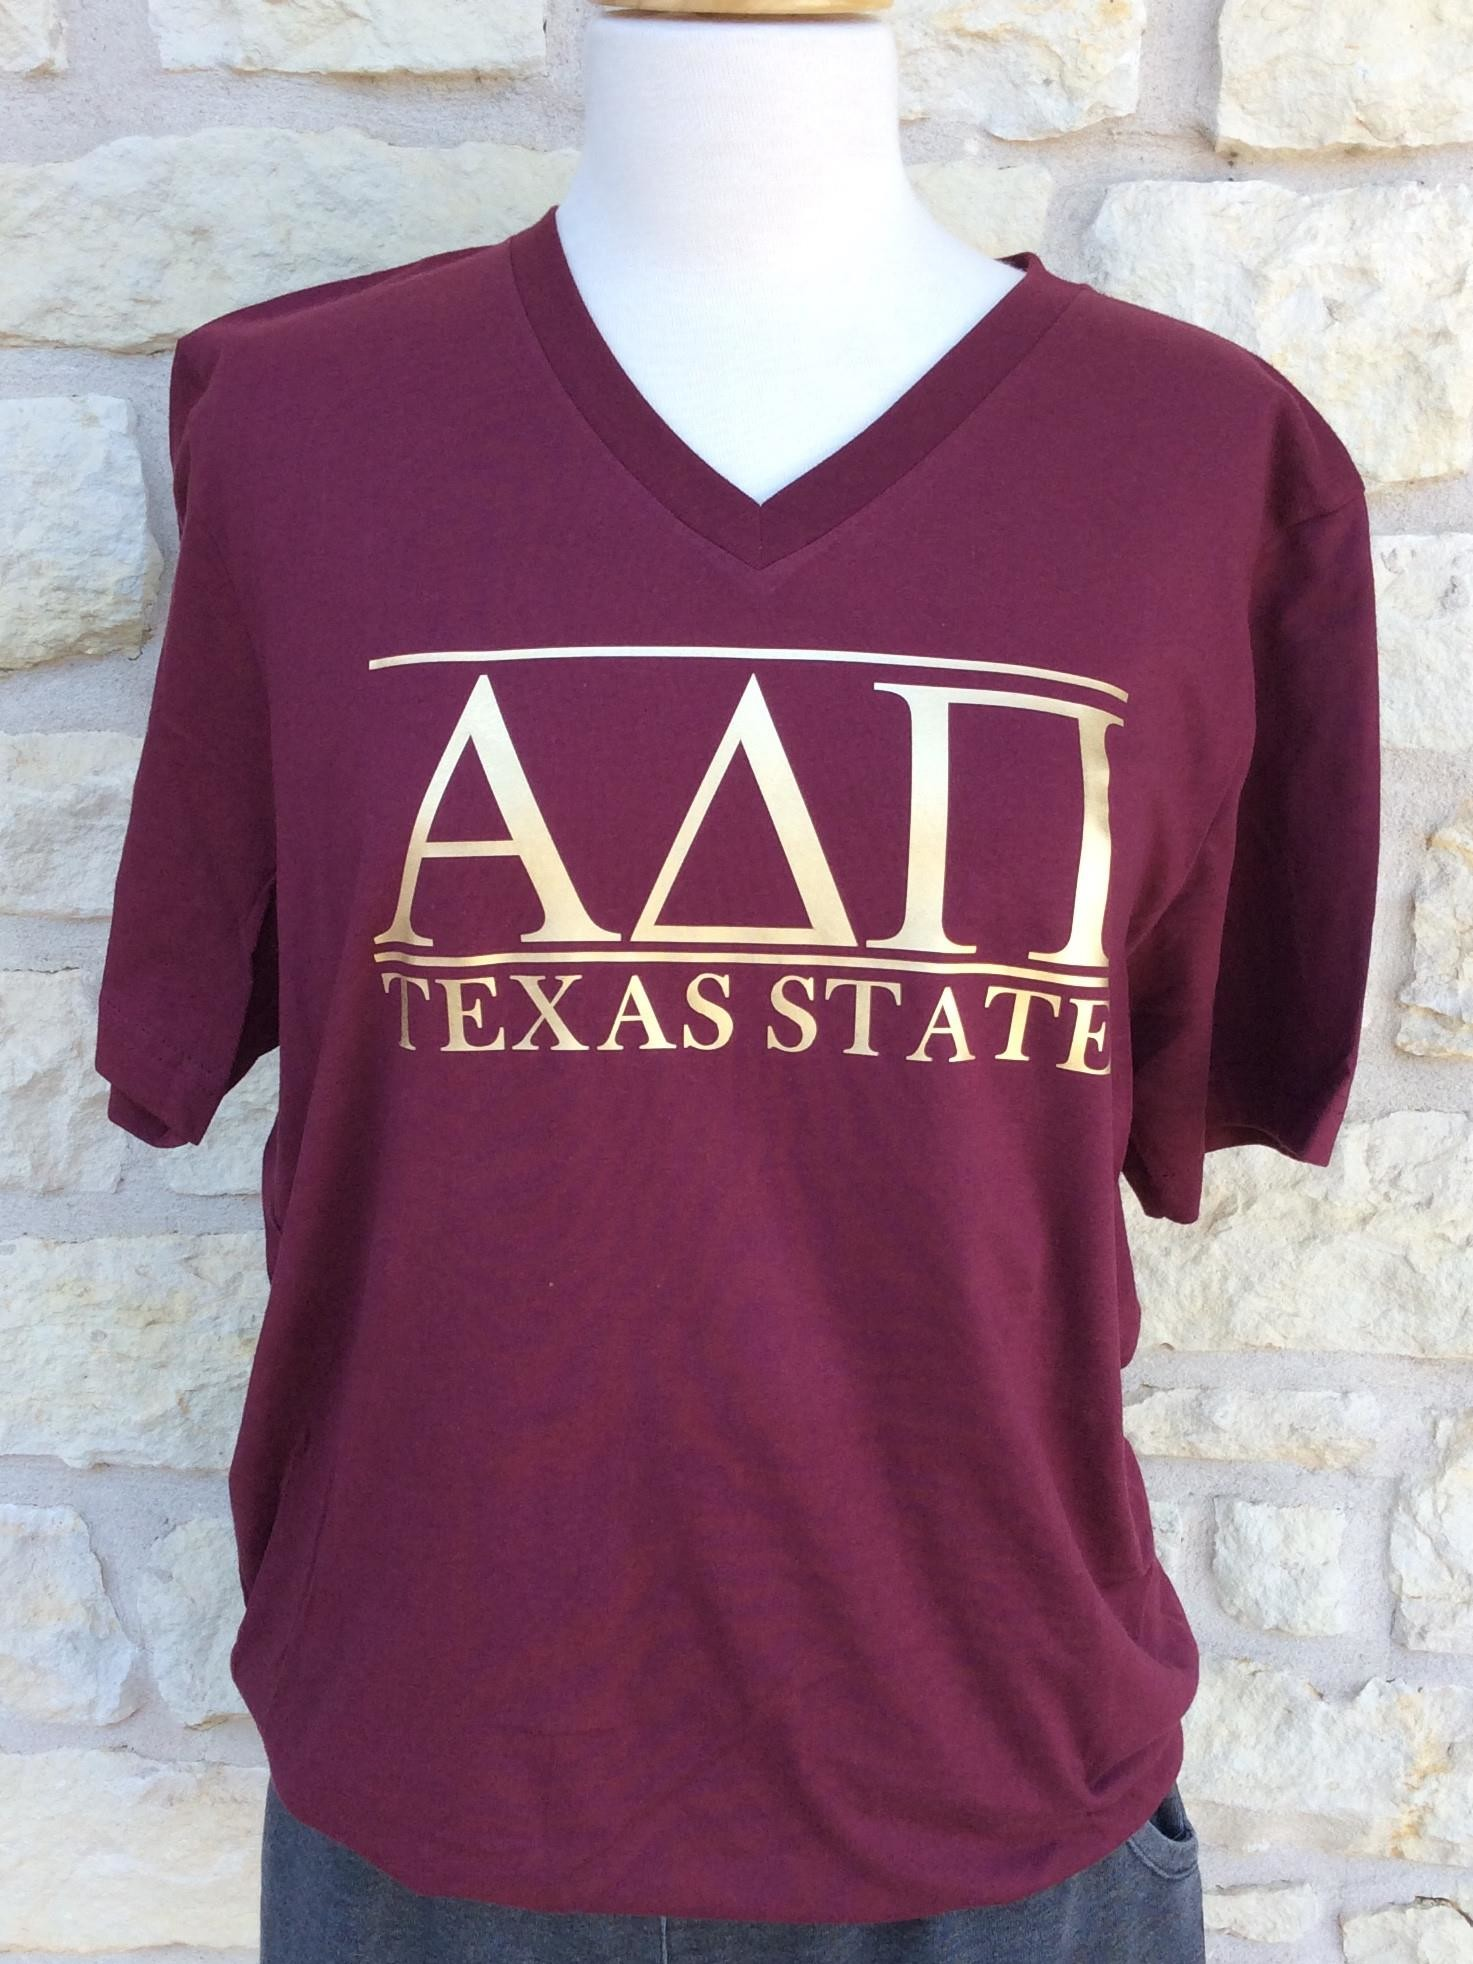 Greek Game Day V-Neck, Texas State Apparel, Custom Greek Life T-shirt